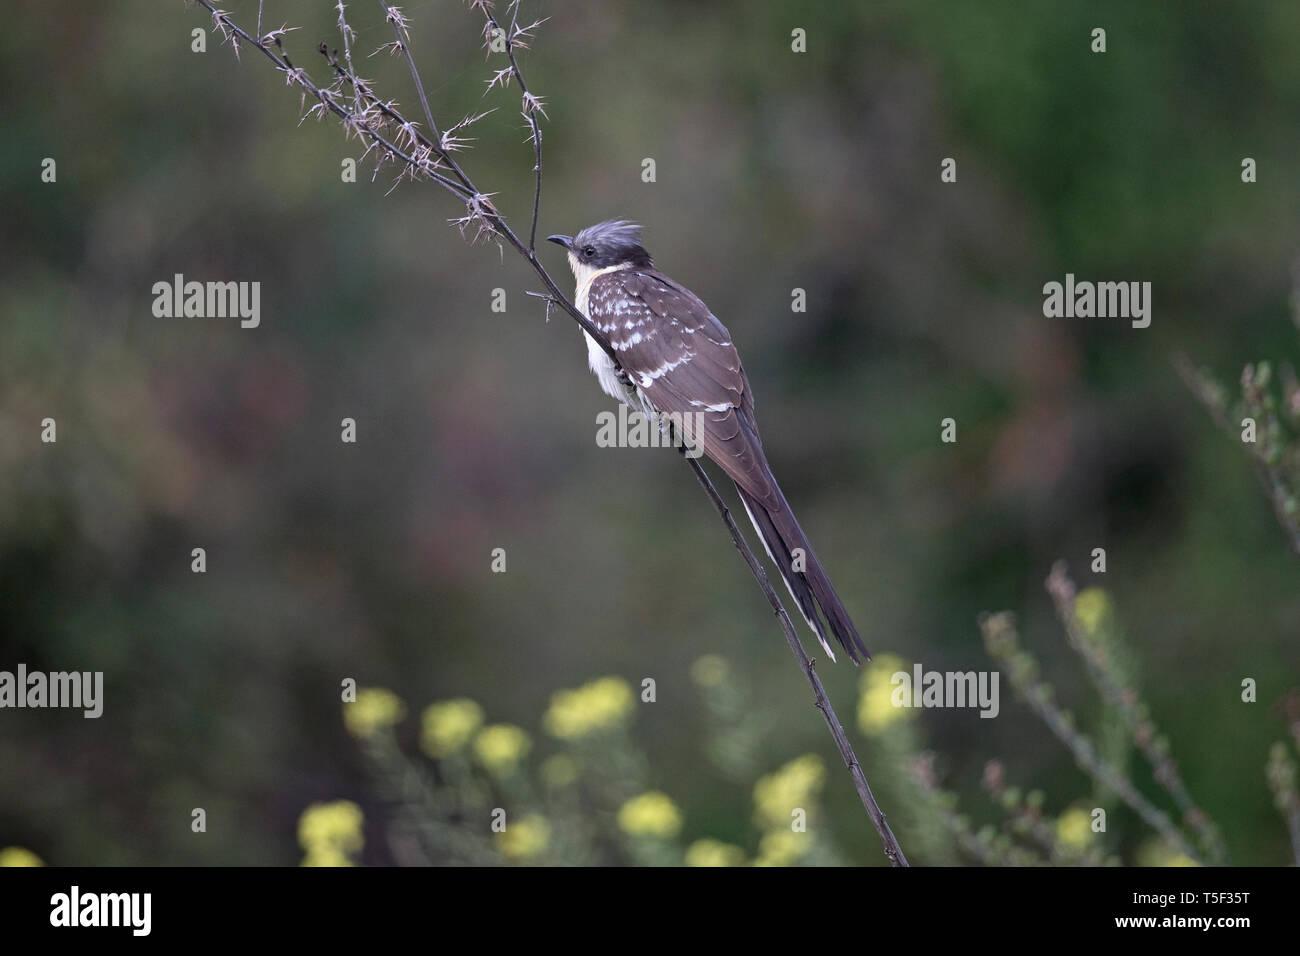 Great Spotted Cuckoo (Clamator glandarius) - Stock Image